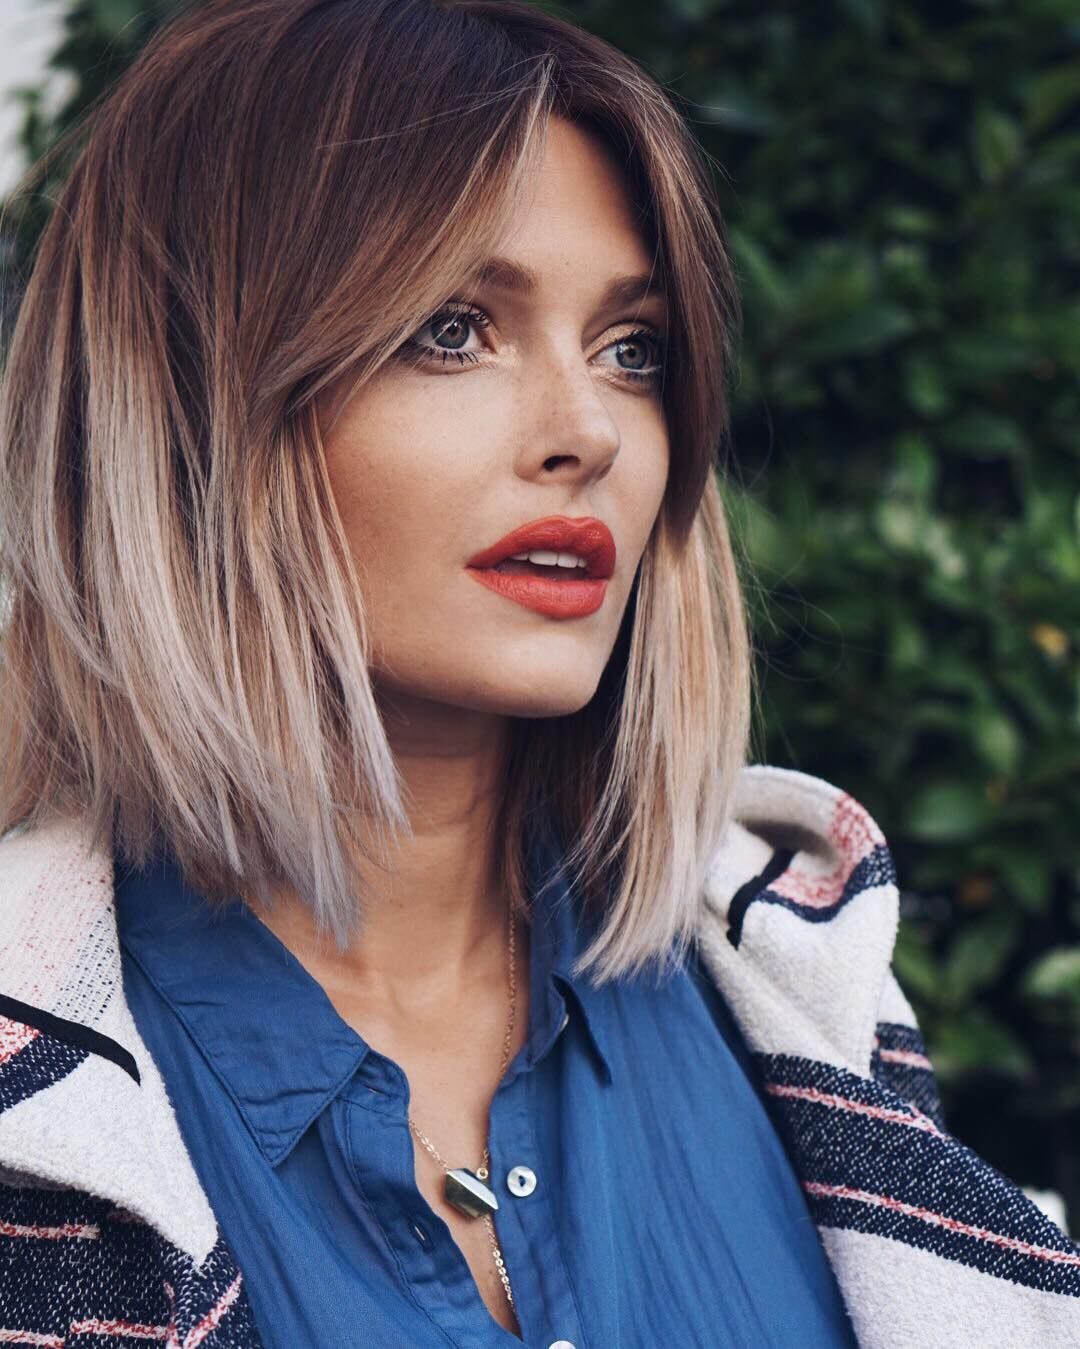 Les plus jolies coiffures de Caroline Receveur Coiffure